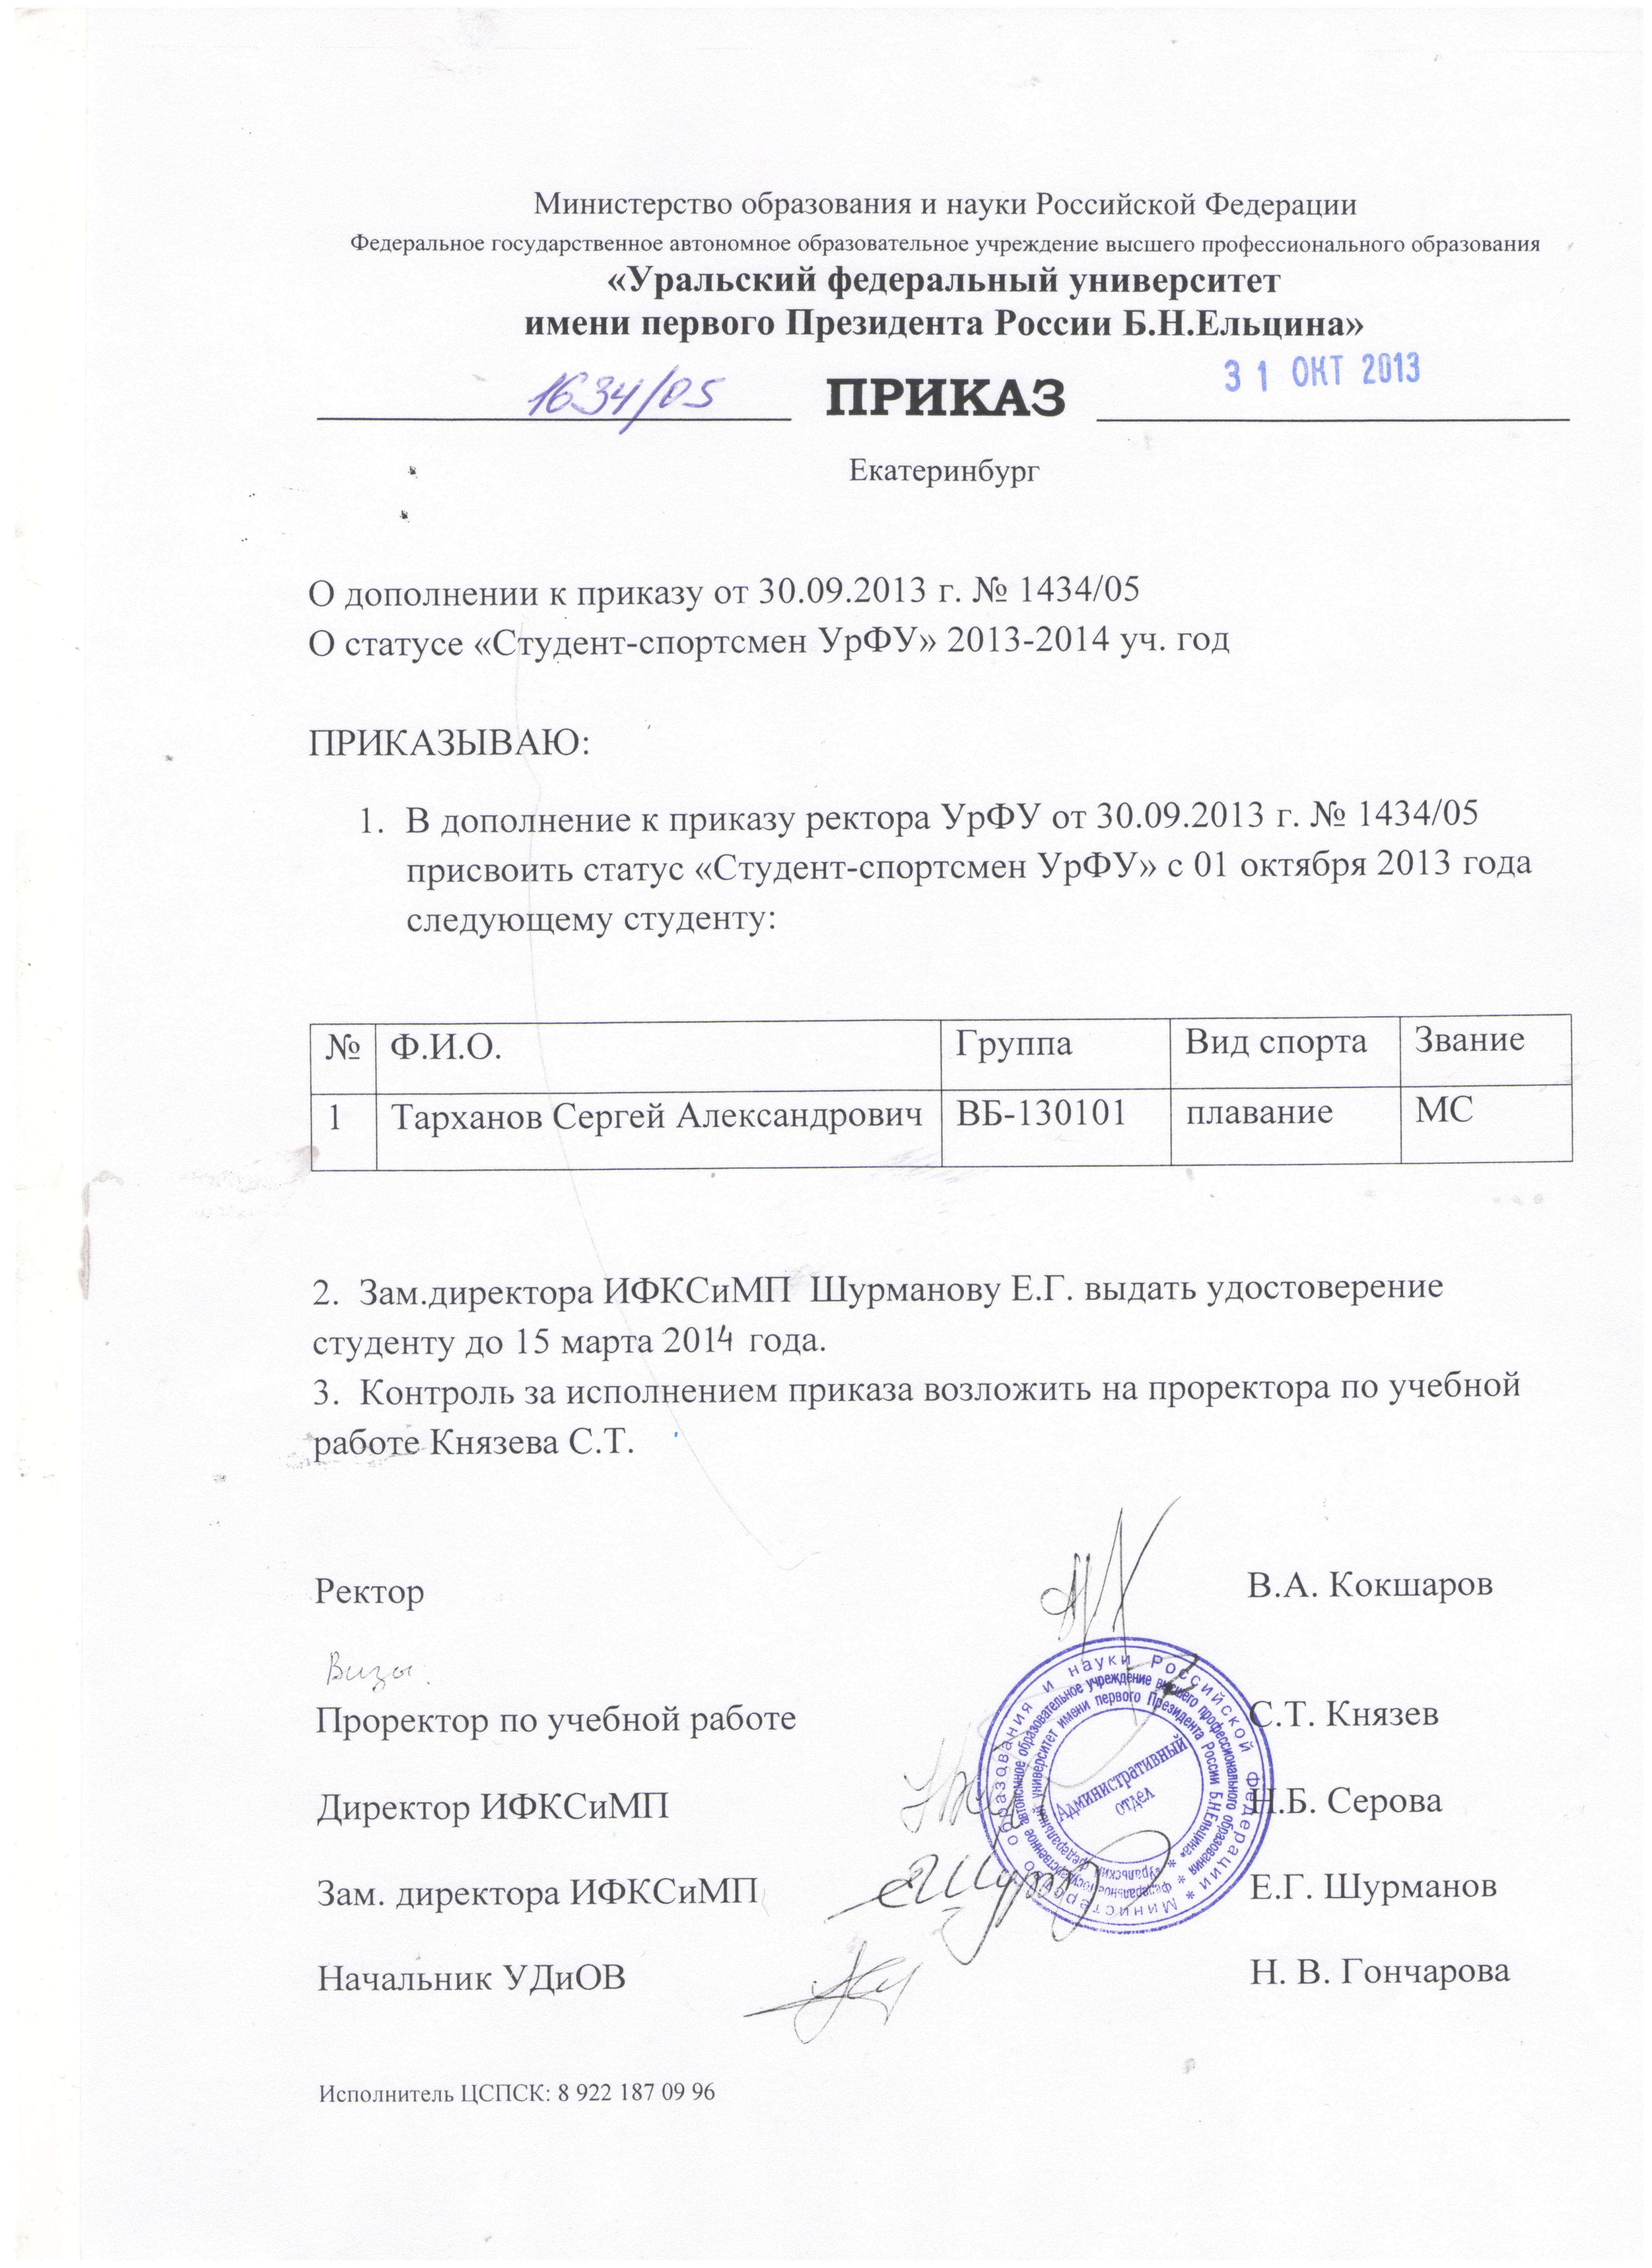 Статус Студент спортсмен УрФУ  Приказ № 1634 05 от 31 10 2013